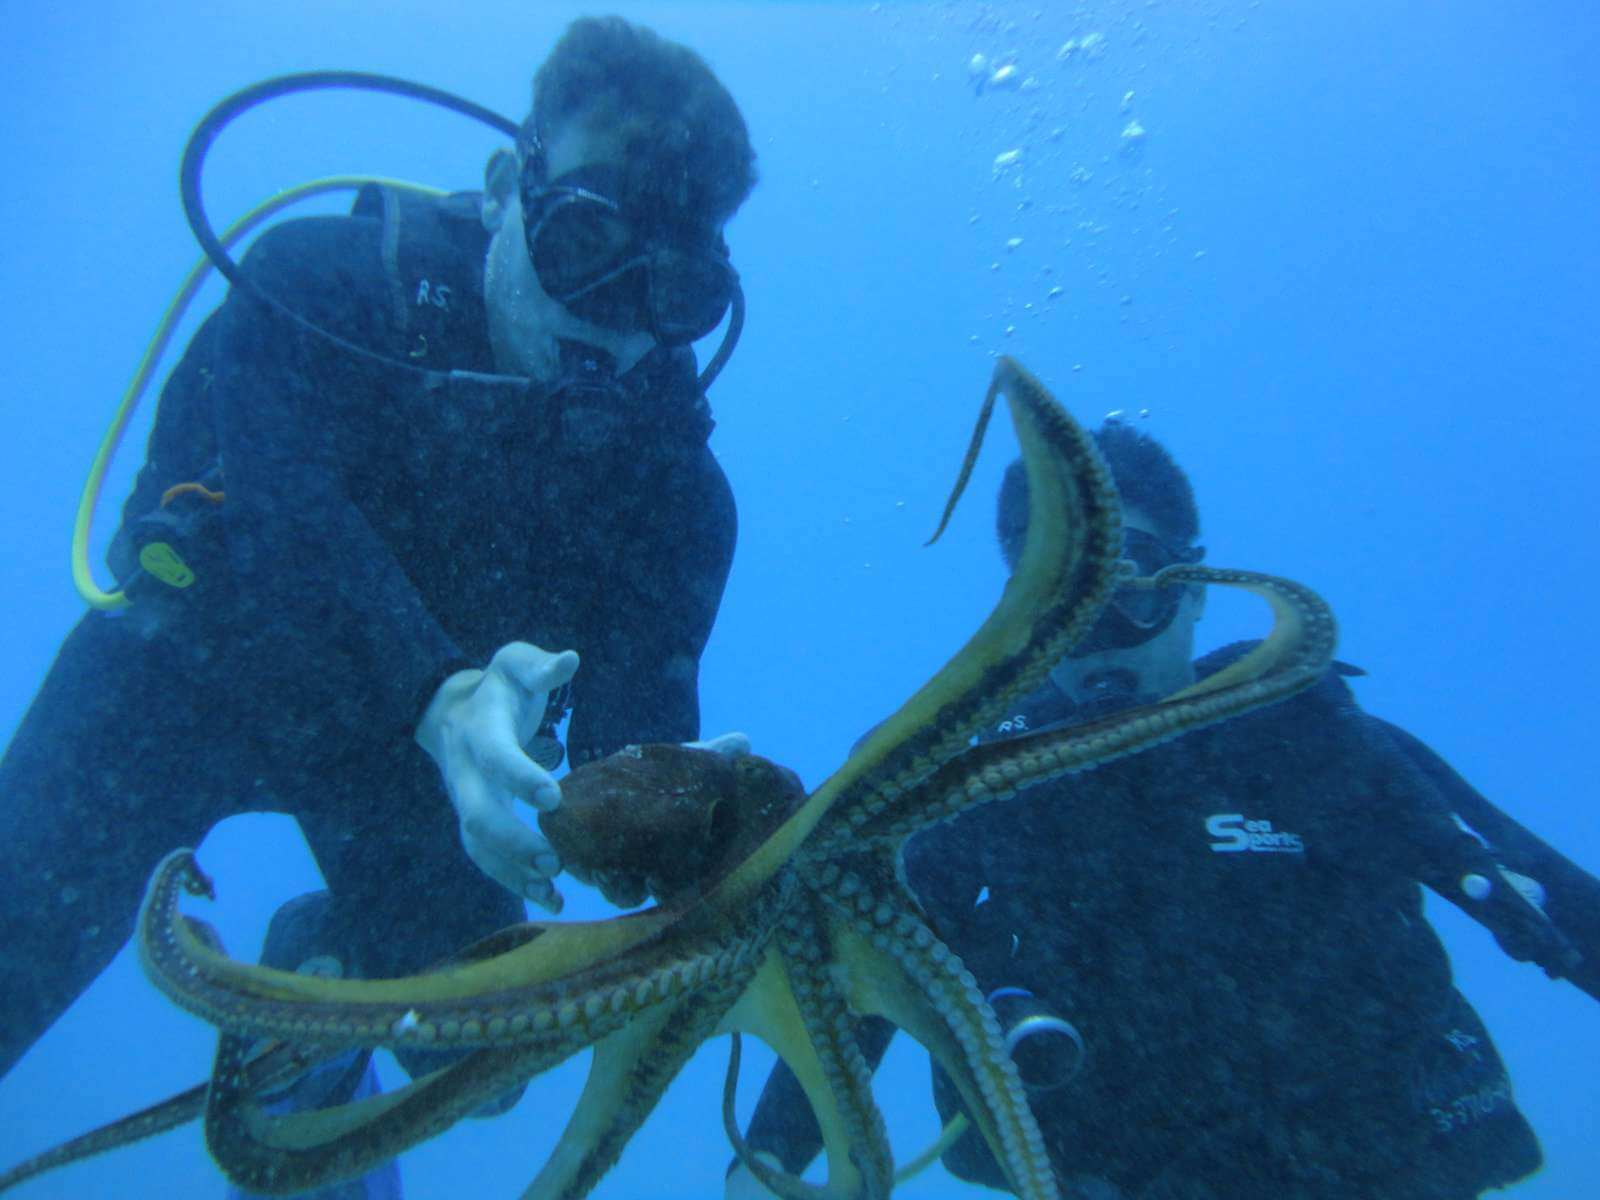 Scuba Diver First time scuba dive hawaii,